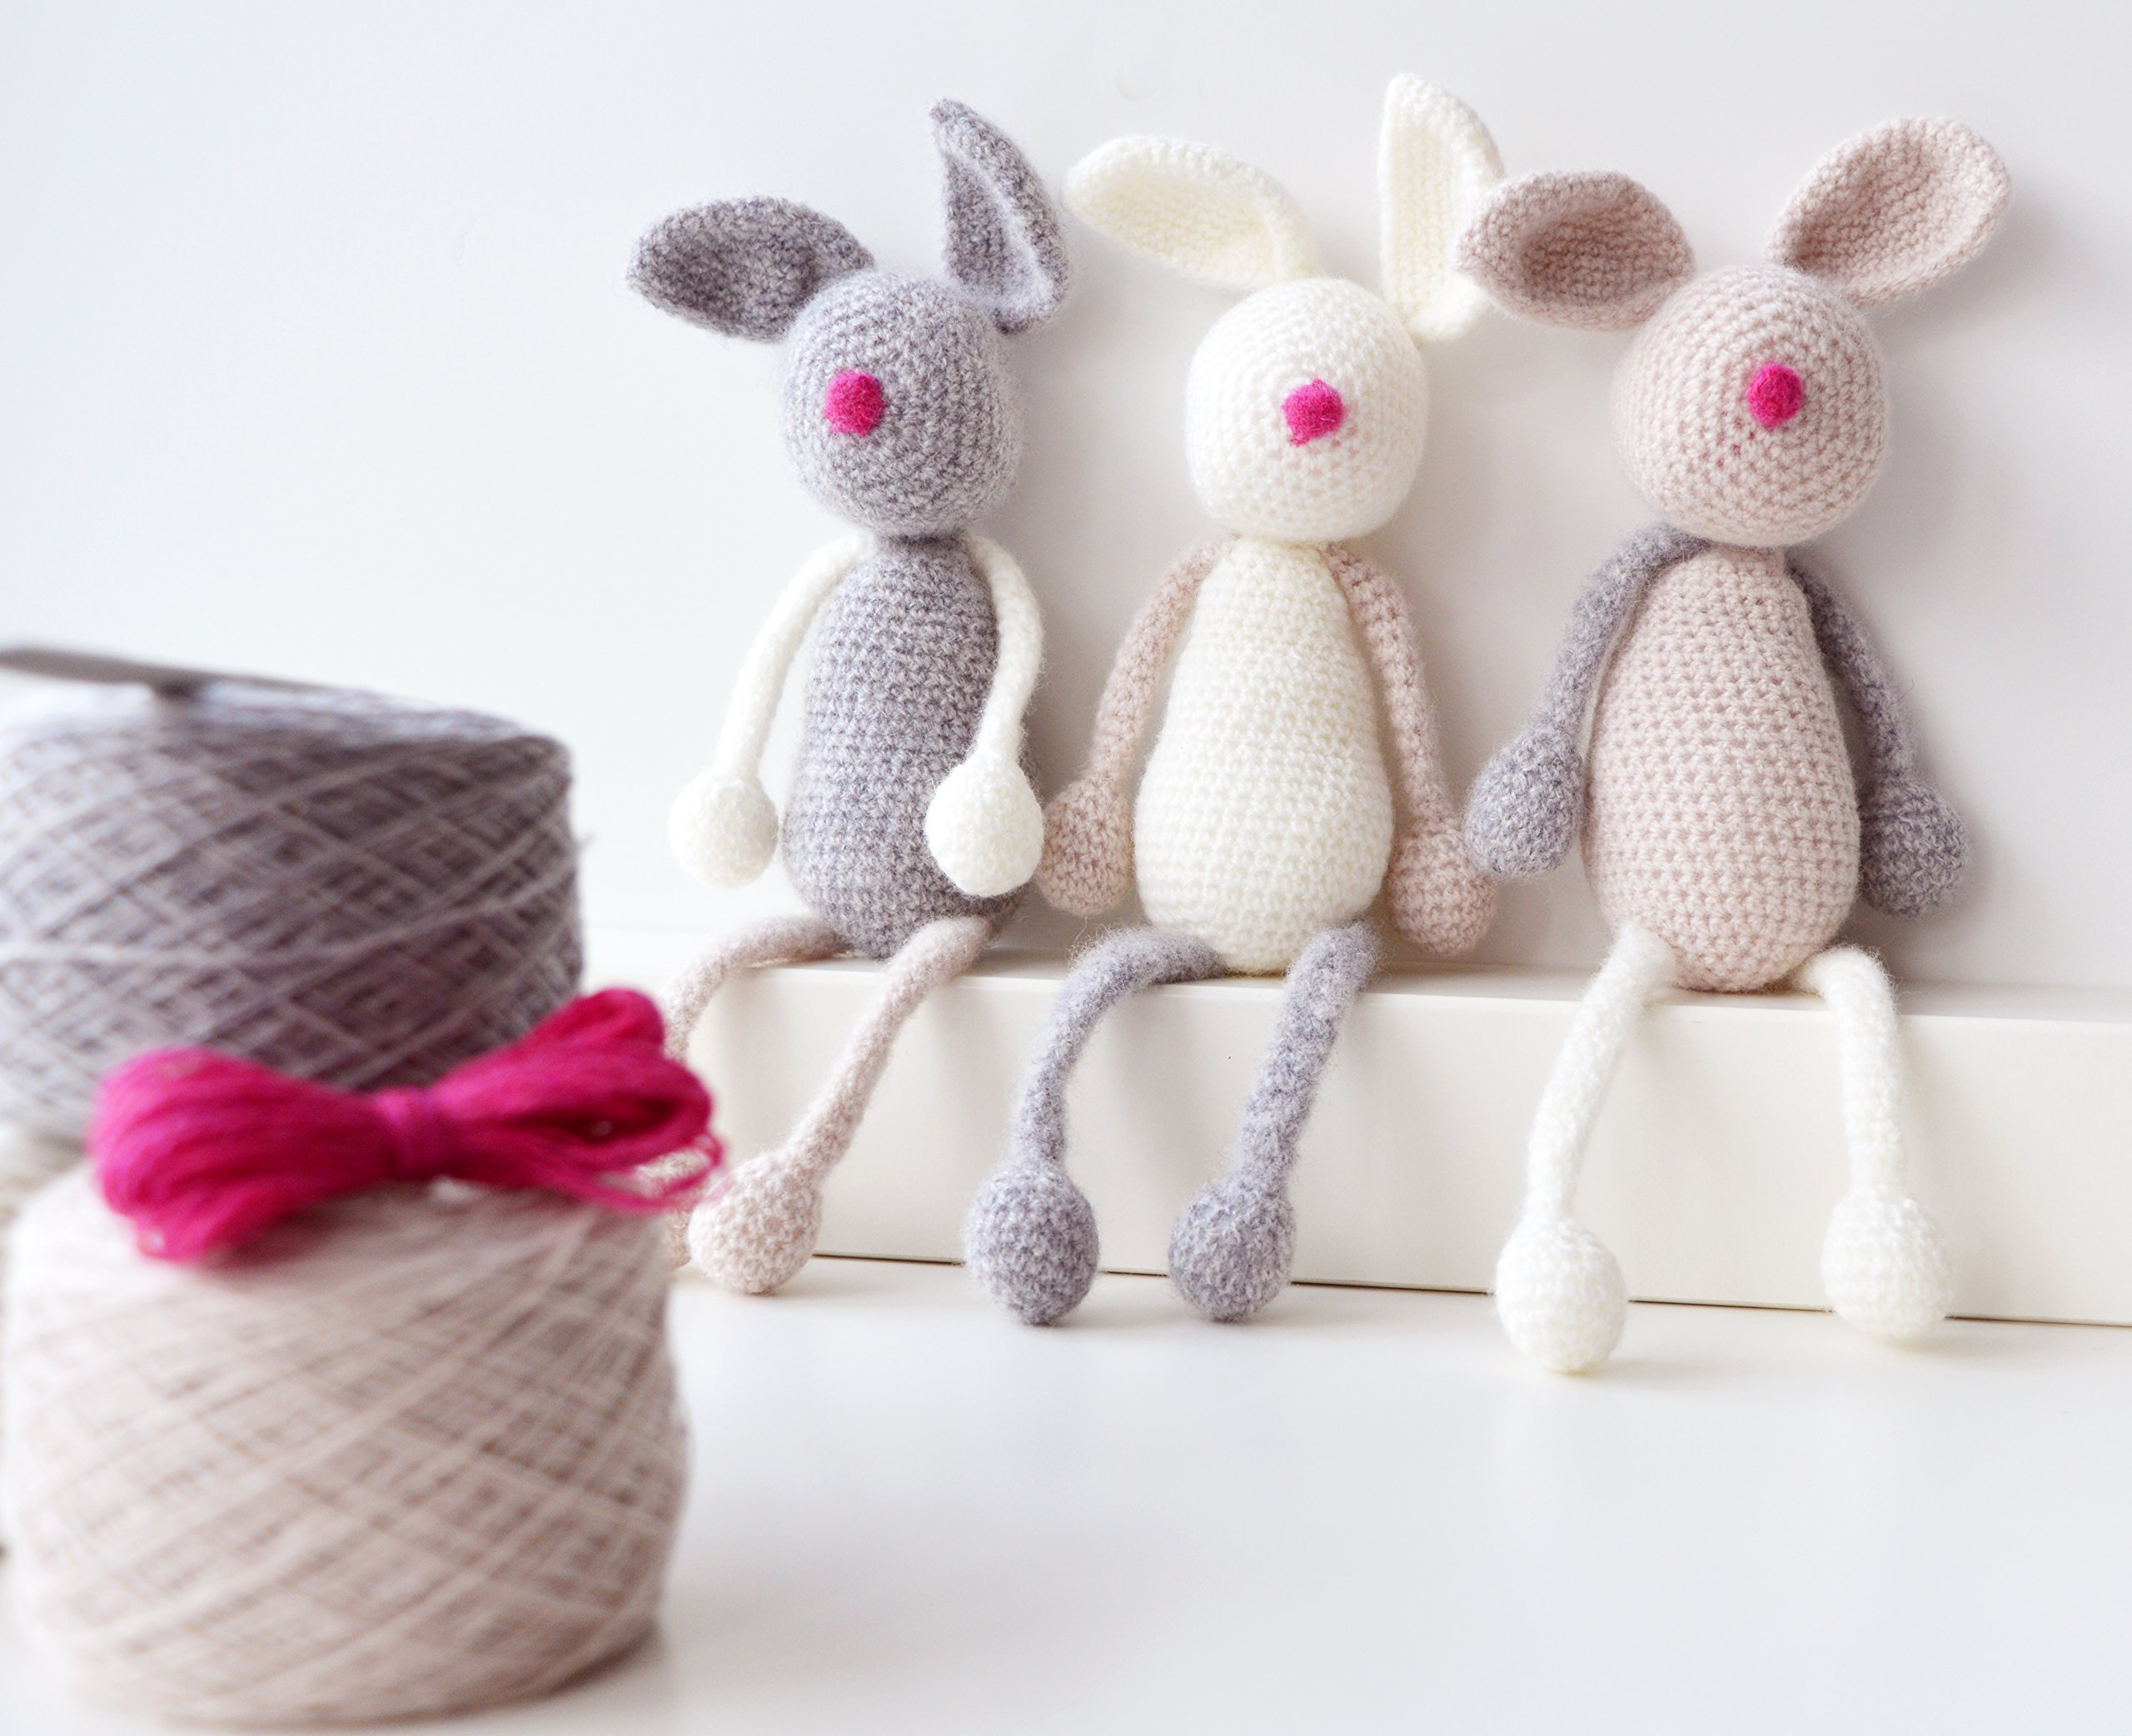 My Little Pony Crochet Kit by Jana Whitley | Crochet kit, Crochet ... | 2085x2560